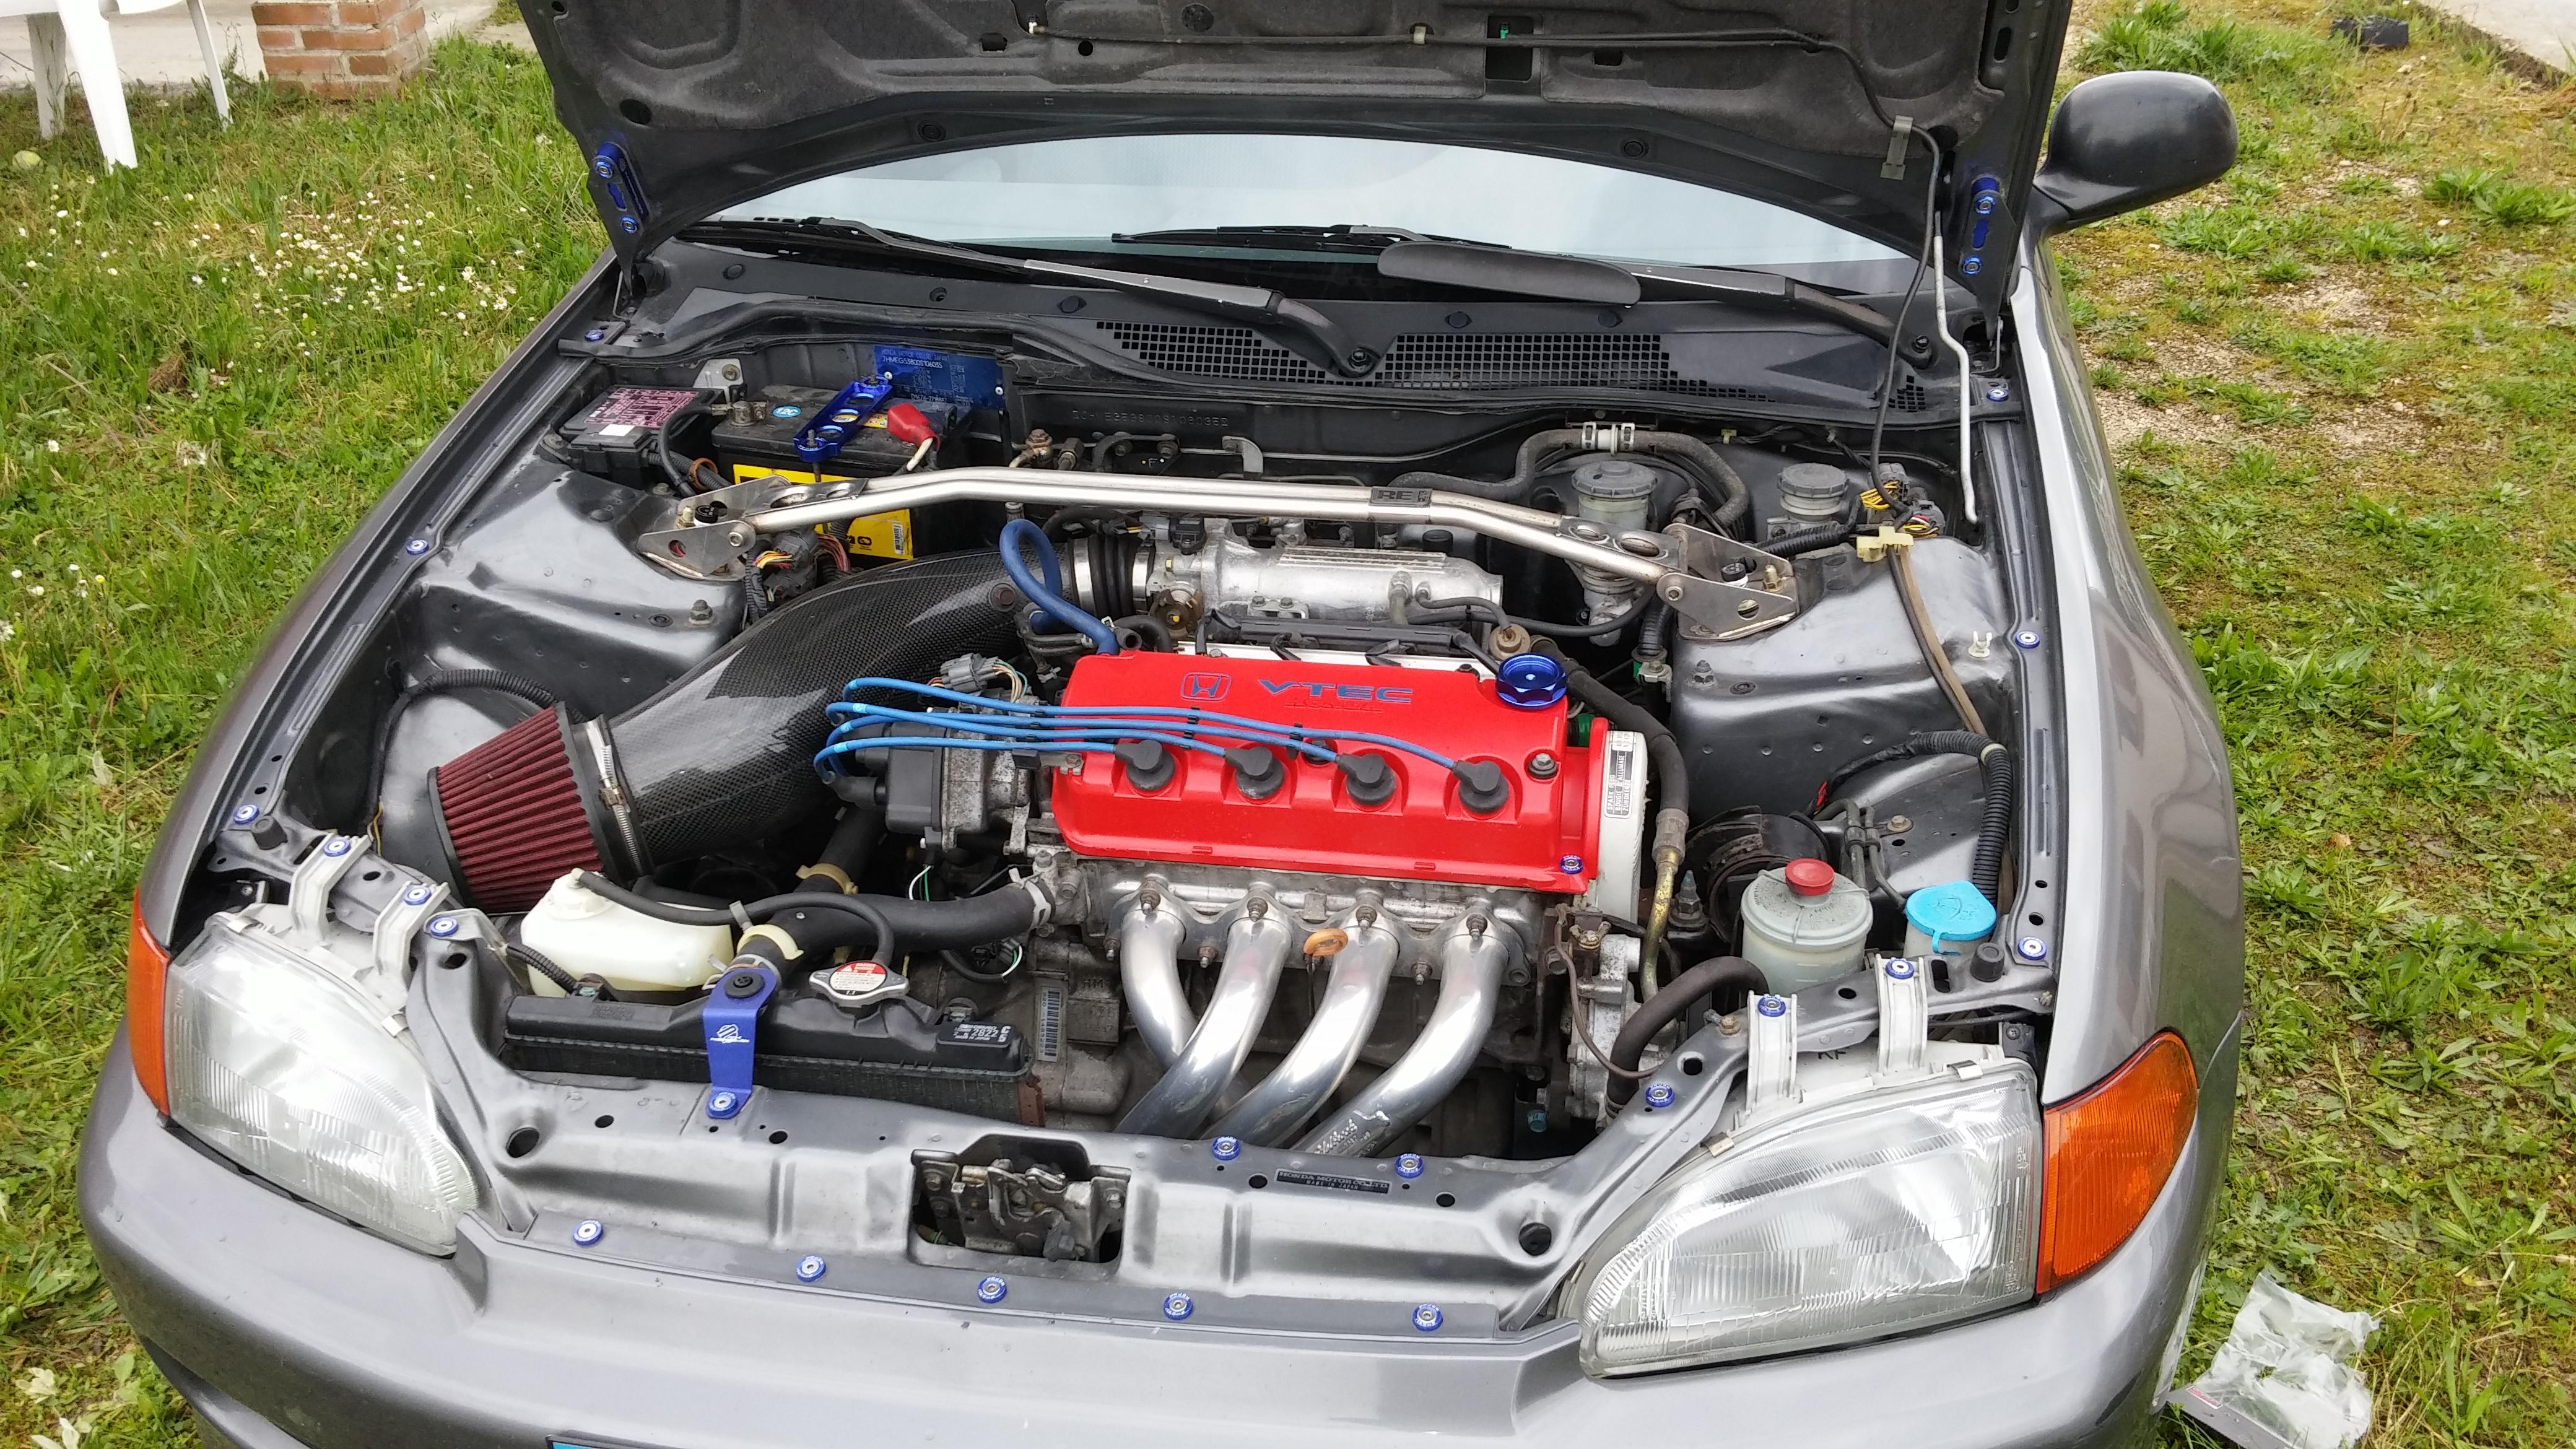 150504070146610160 ForzaMotorsport.fr